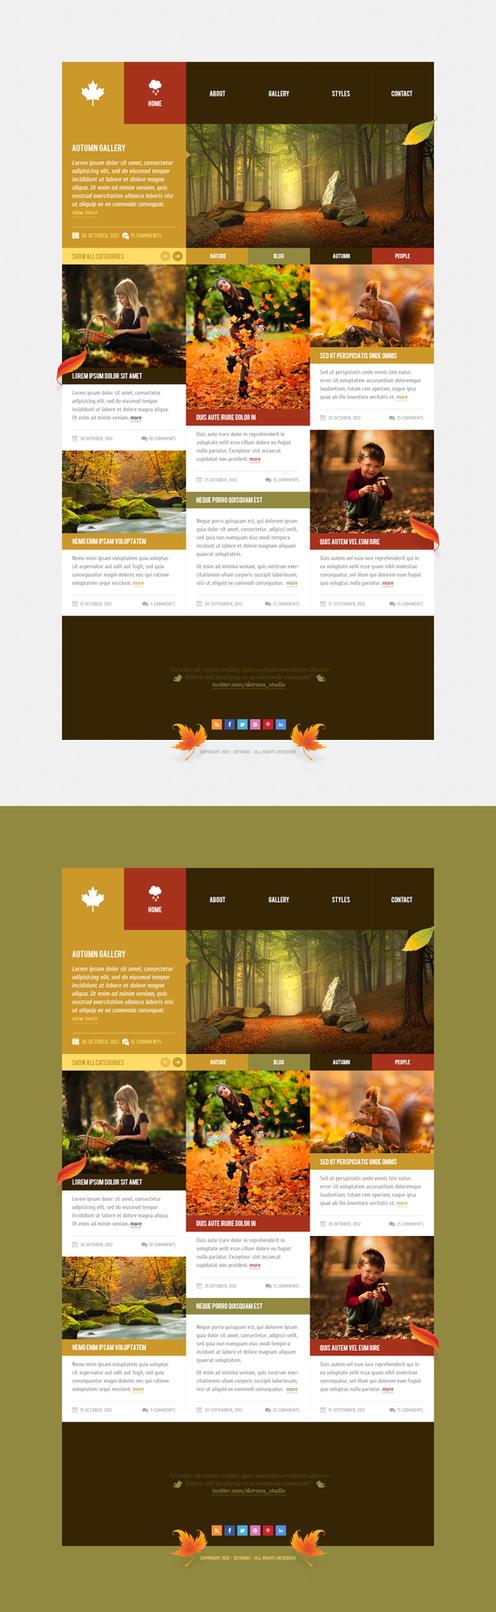 Autumn - WordPress Theme by detrans